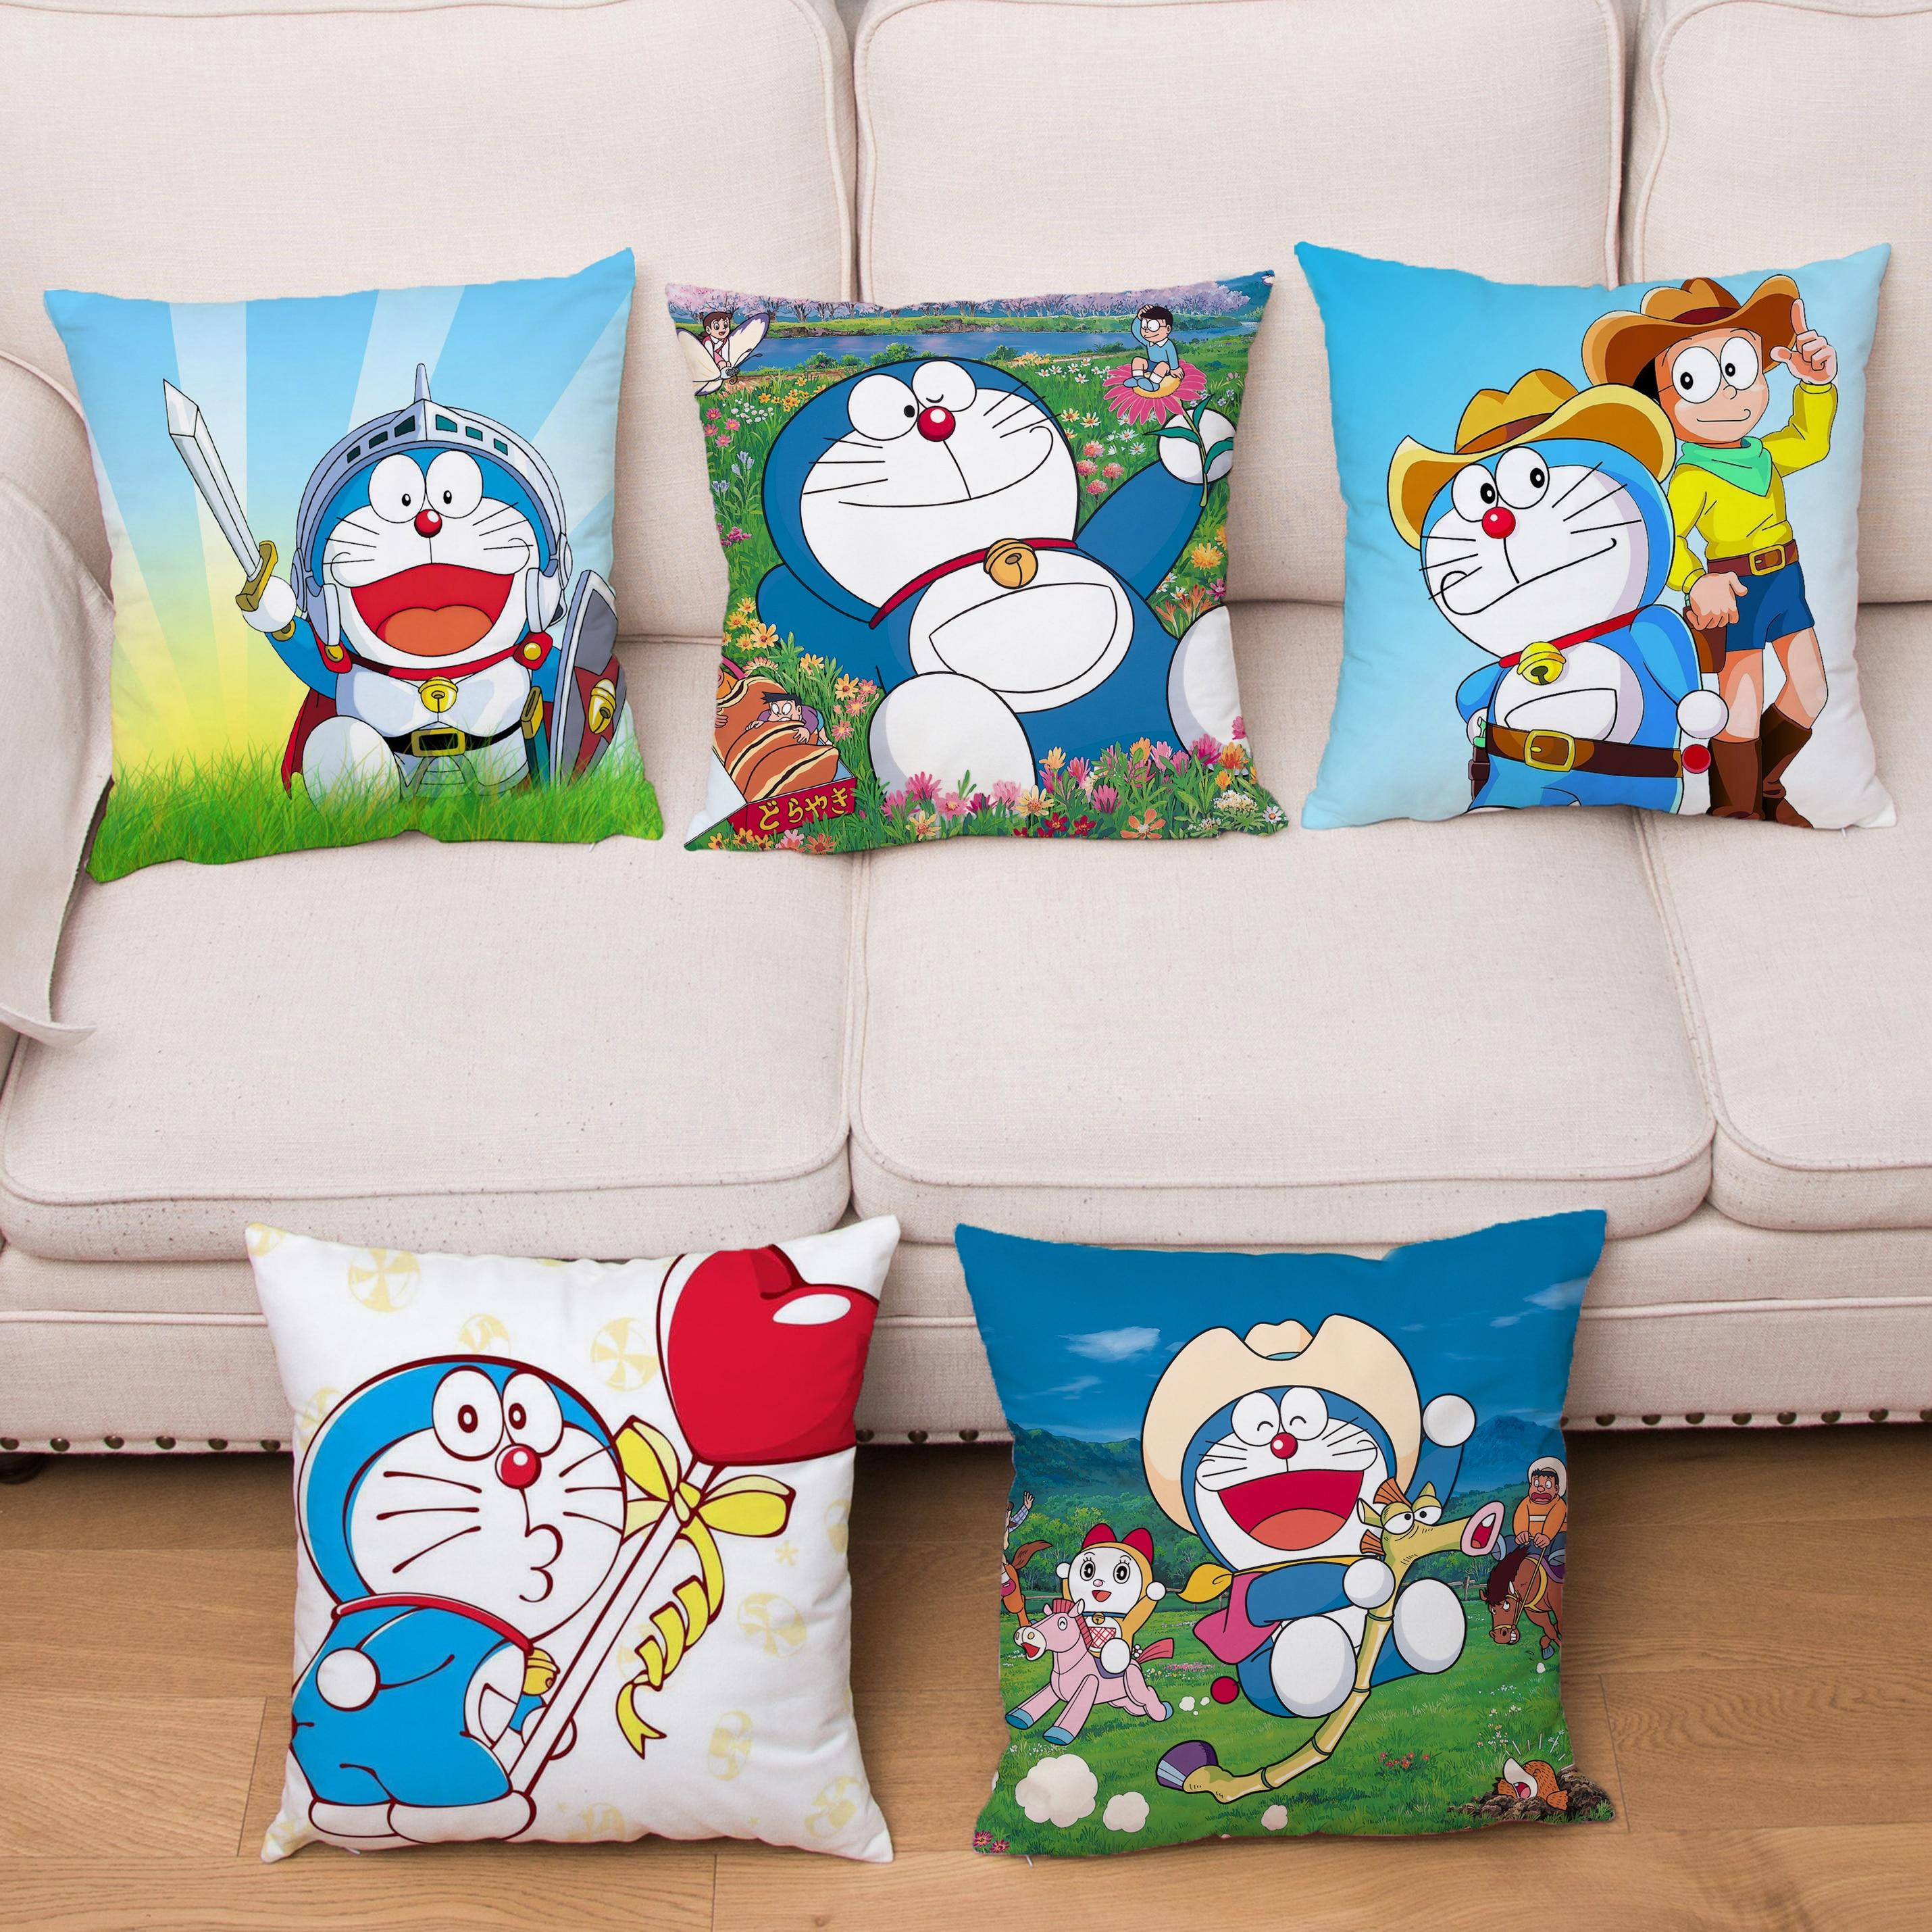 Japón animé Doraemon cojín de dibujos animados lindo gato Robot funda de cojín estampada de peluche corto funda de almohada almohadas para decoración de hogar cubre